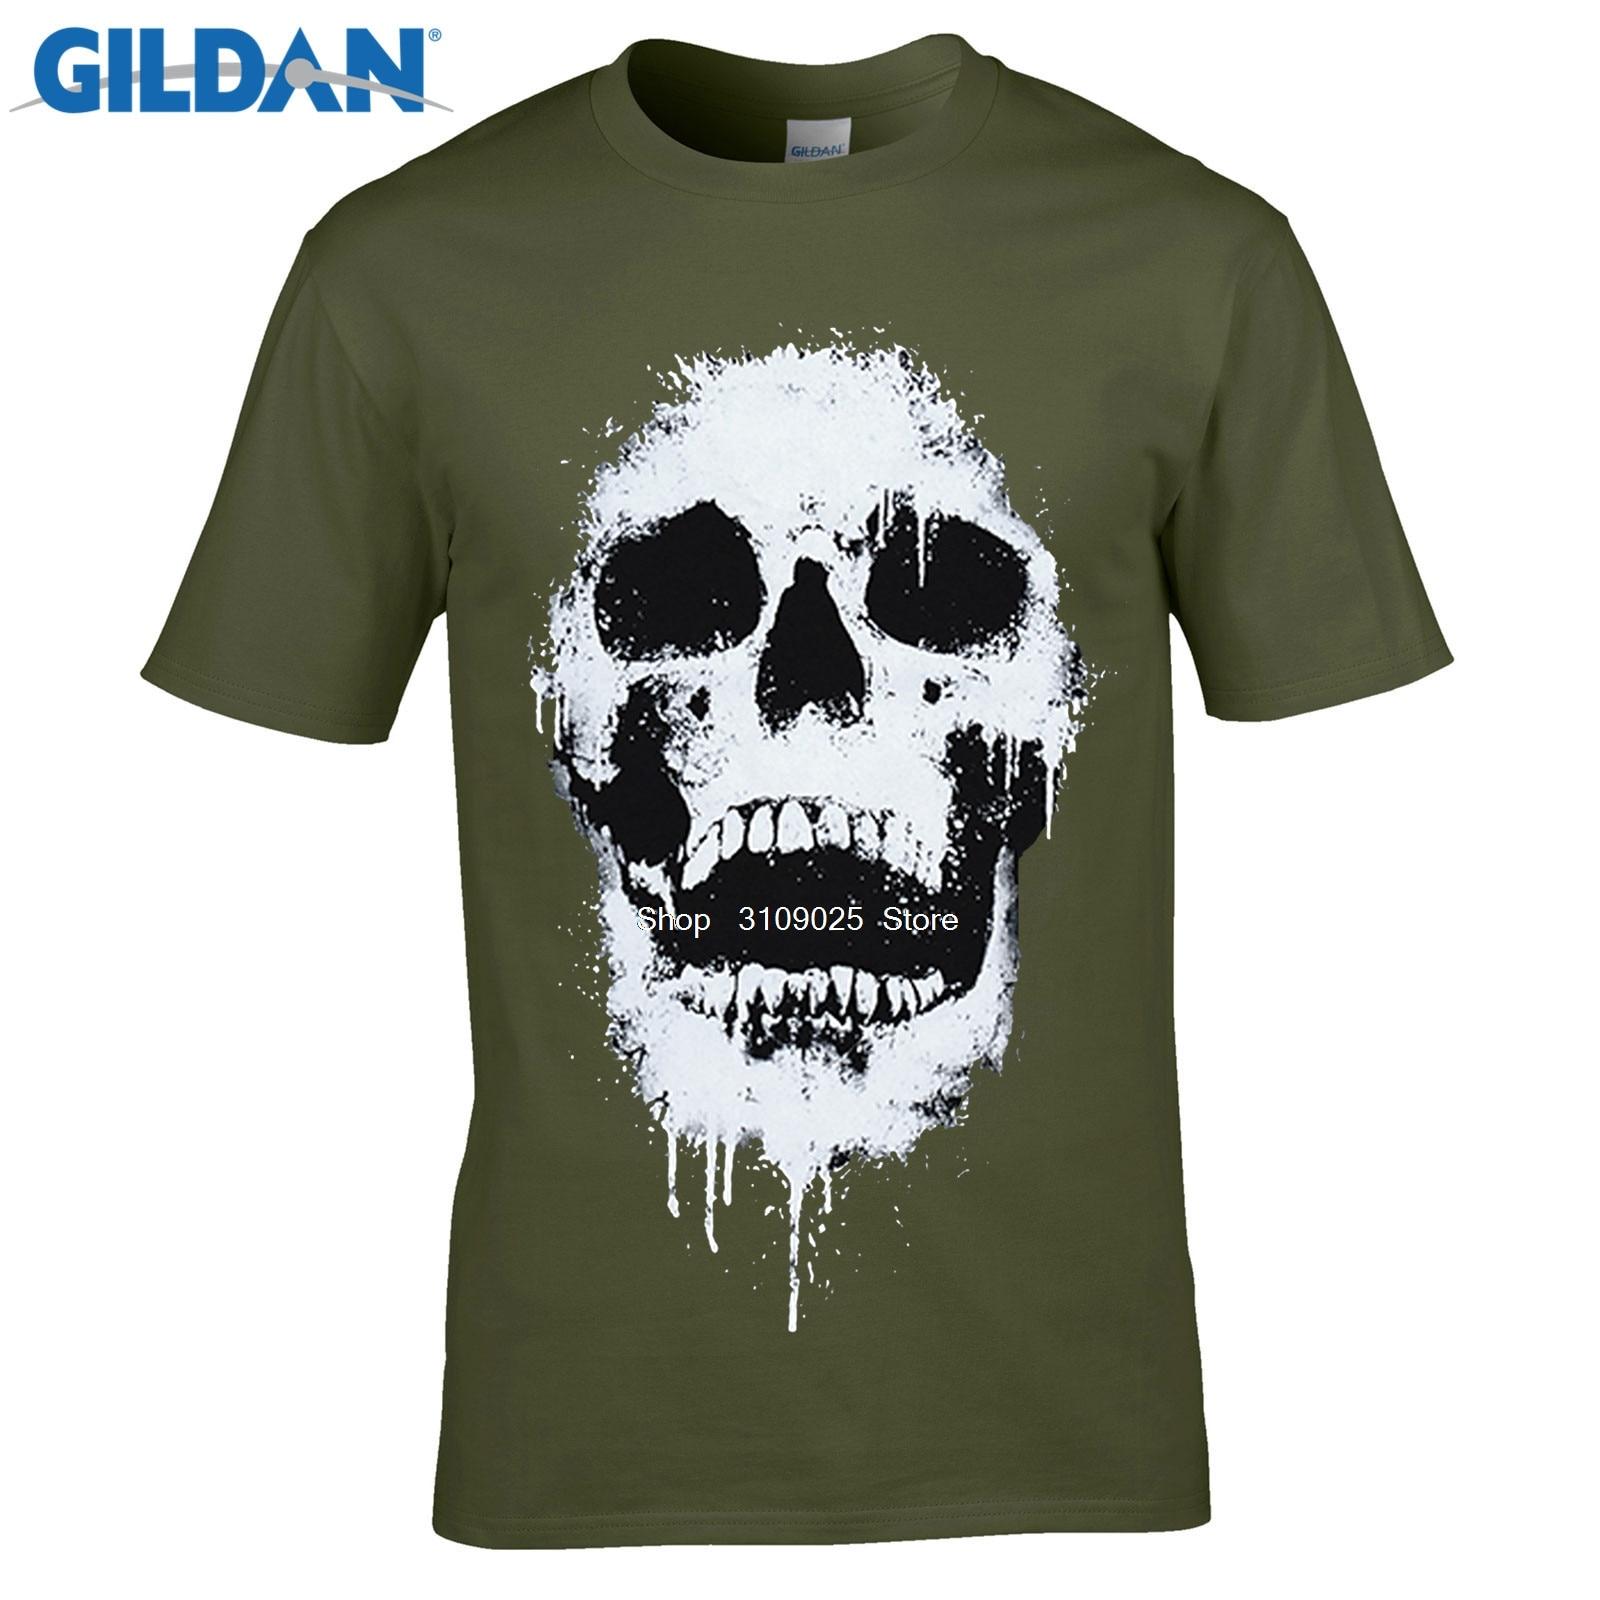 Black t shirt diy - Gildan Diy Style Mens T Shirts Men S Black T Shirt Skull Print Quality Odell Cotton